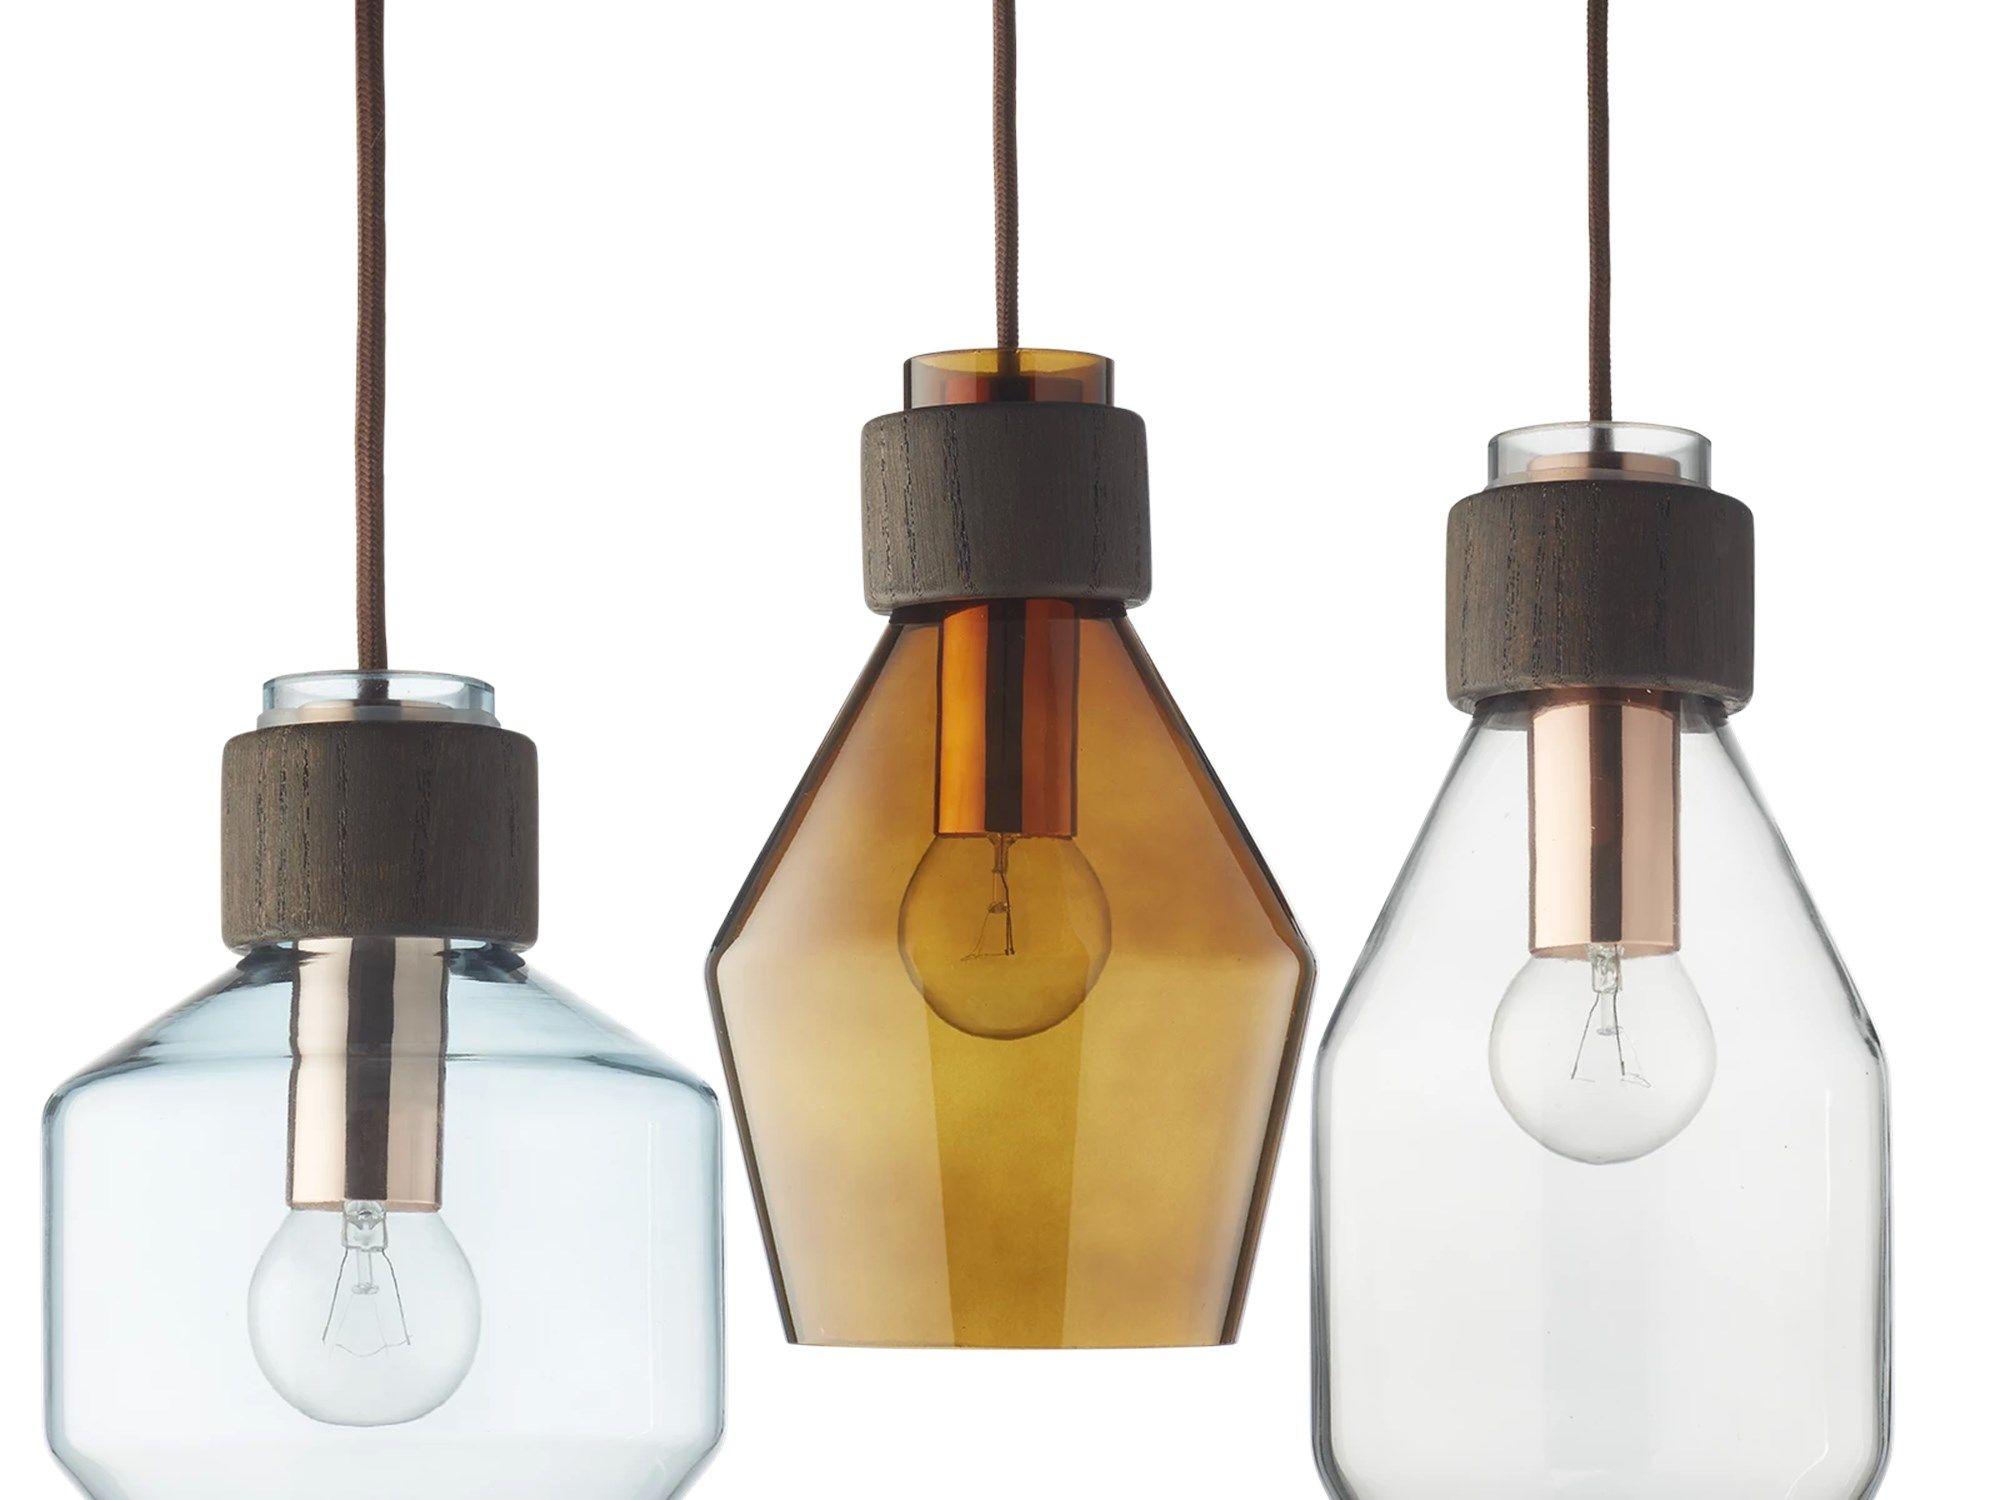 vetro pendel wide lampe einrichtung lighting lighting. Black Bedroom Furniture Sets. Home Design Ideas